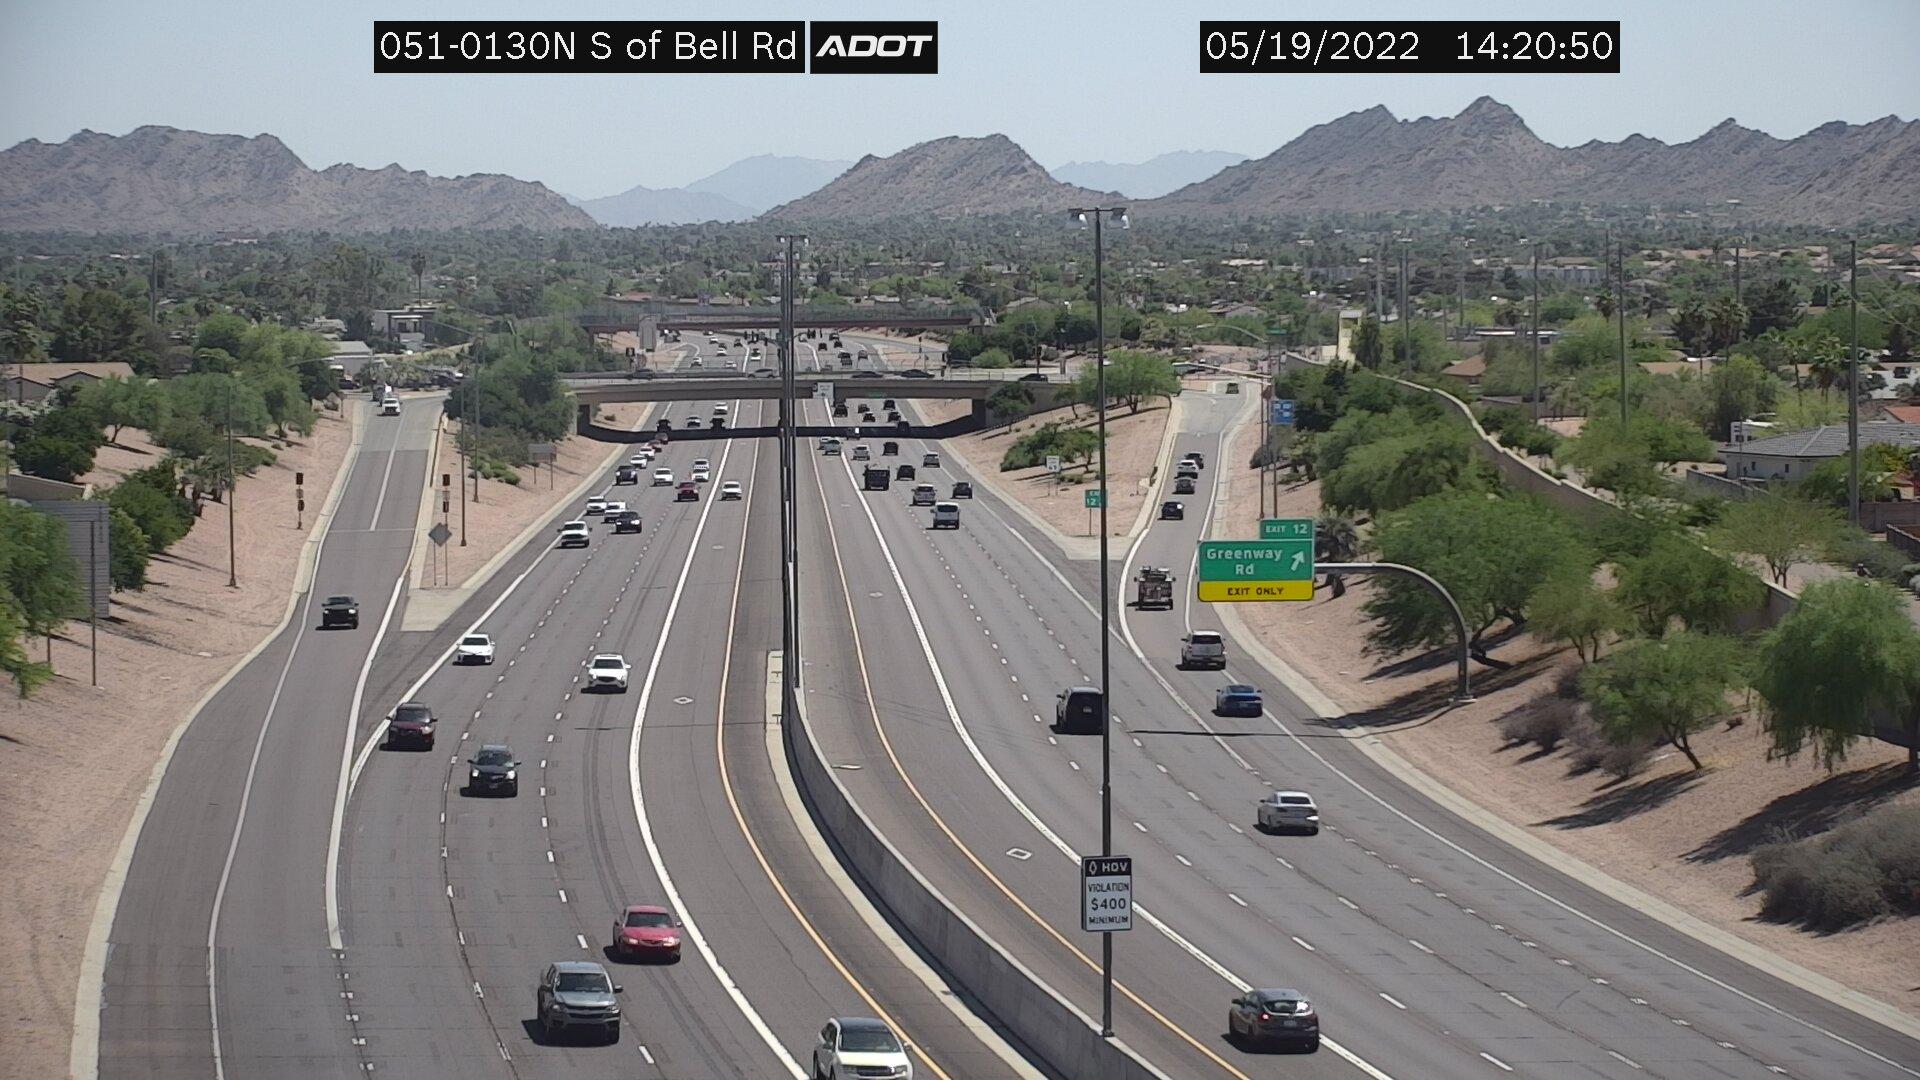 S of Bell NB (SR51) (089) - Phoenix and Arizona